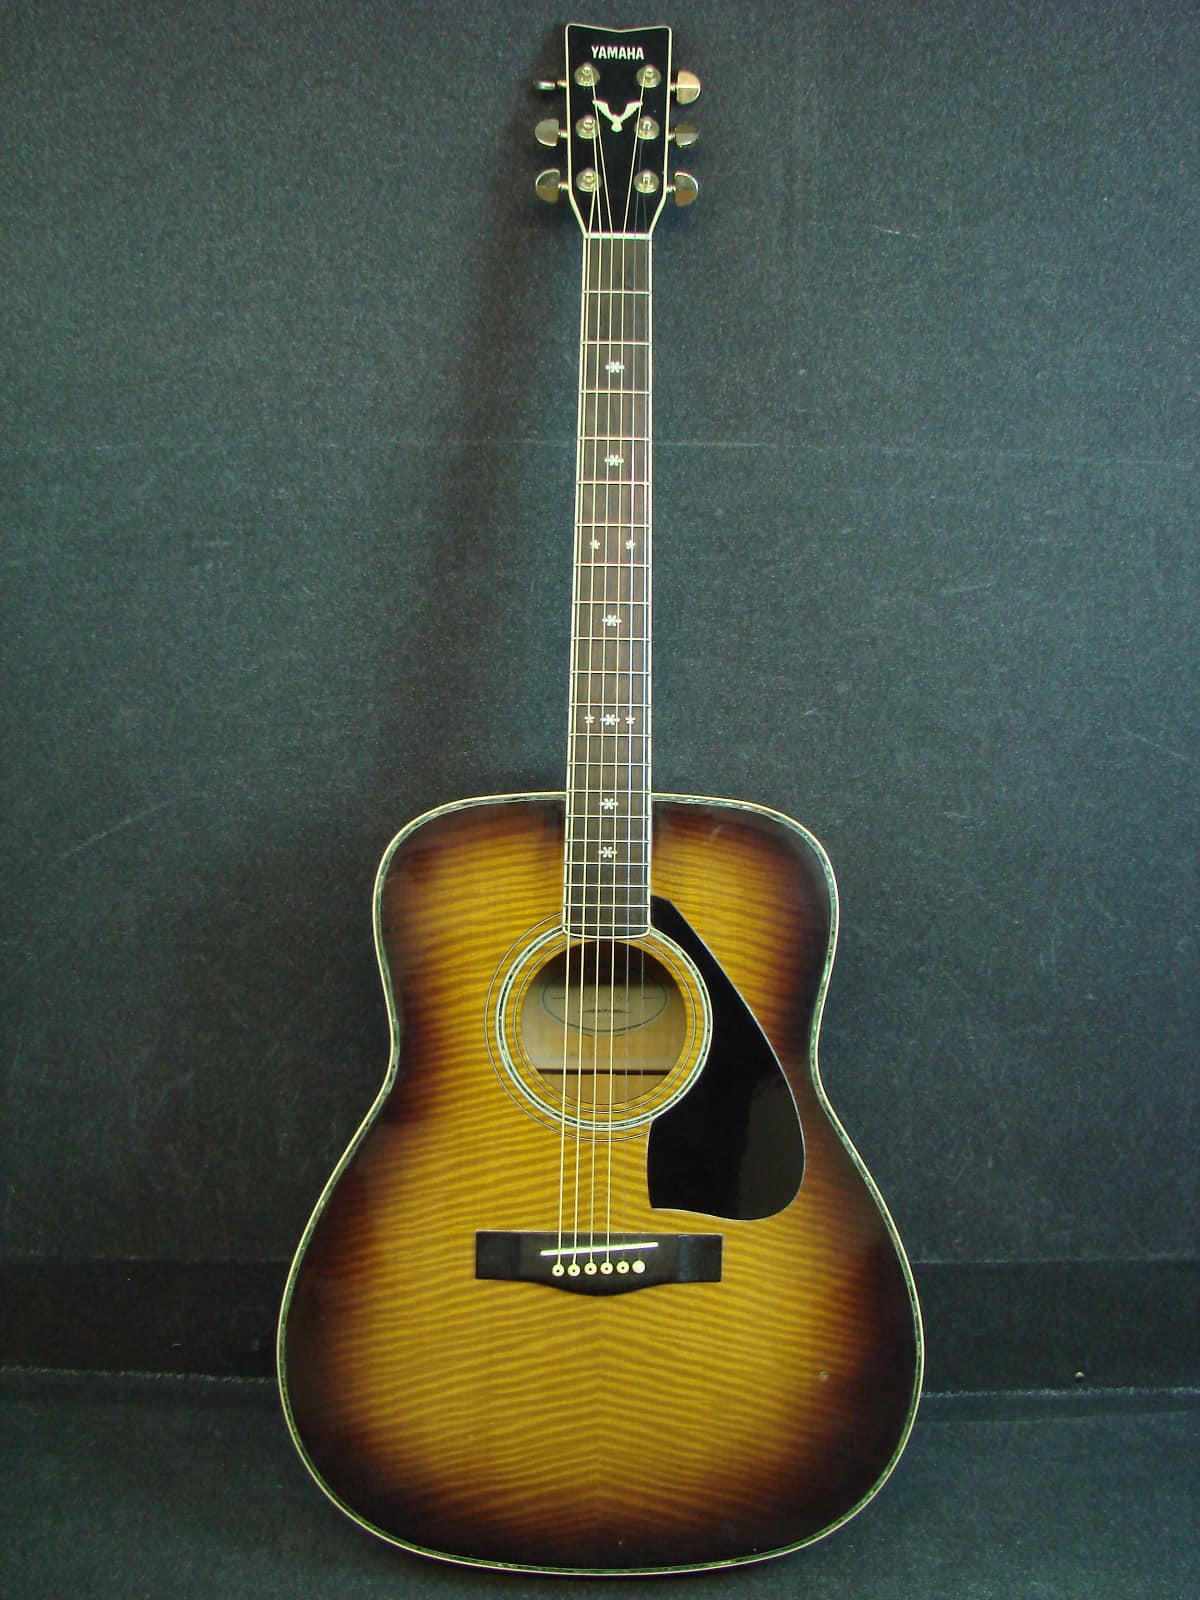 Yamaha Acoustic Guitar Model F